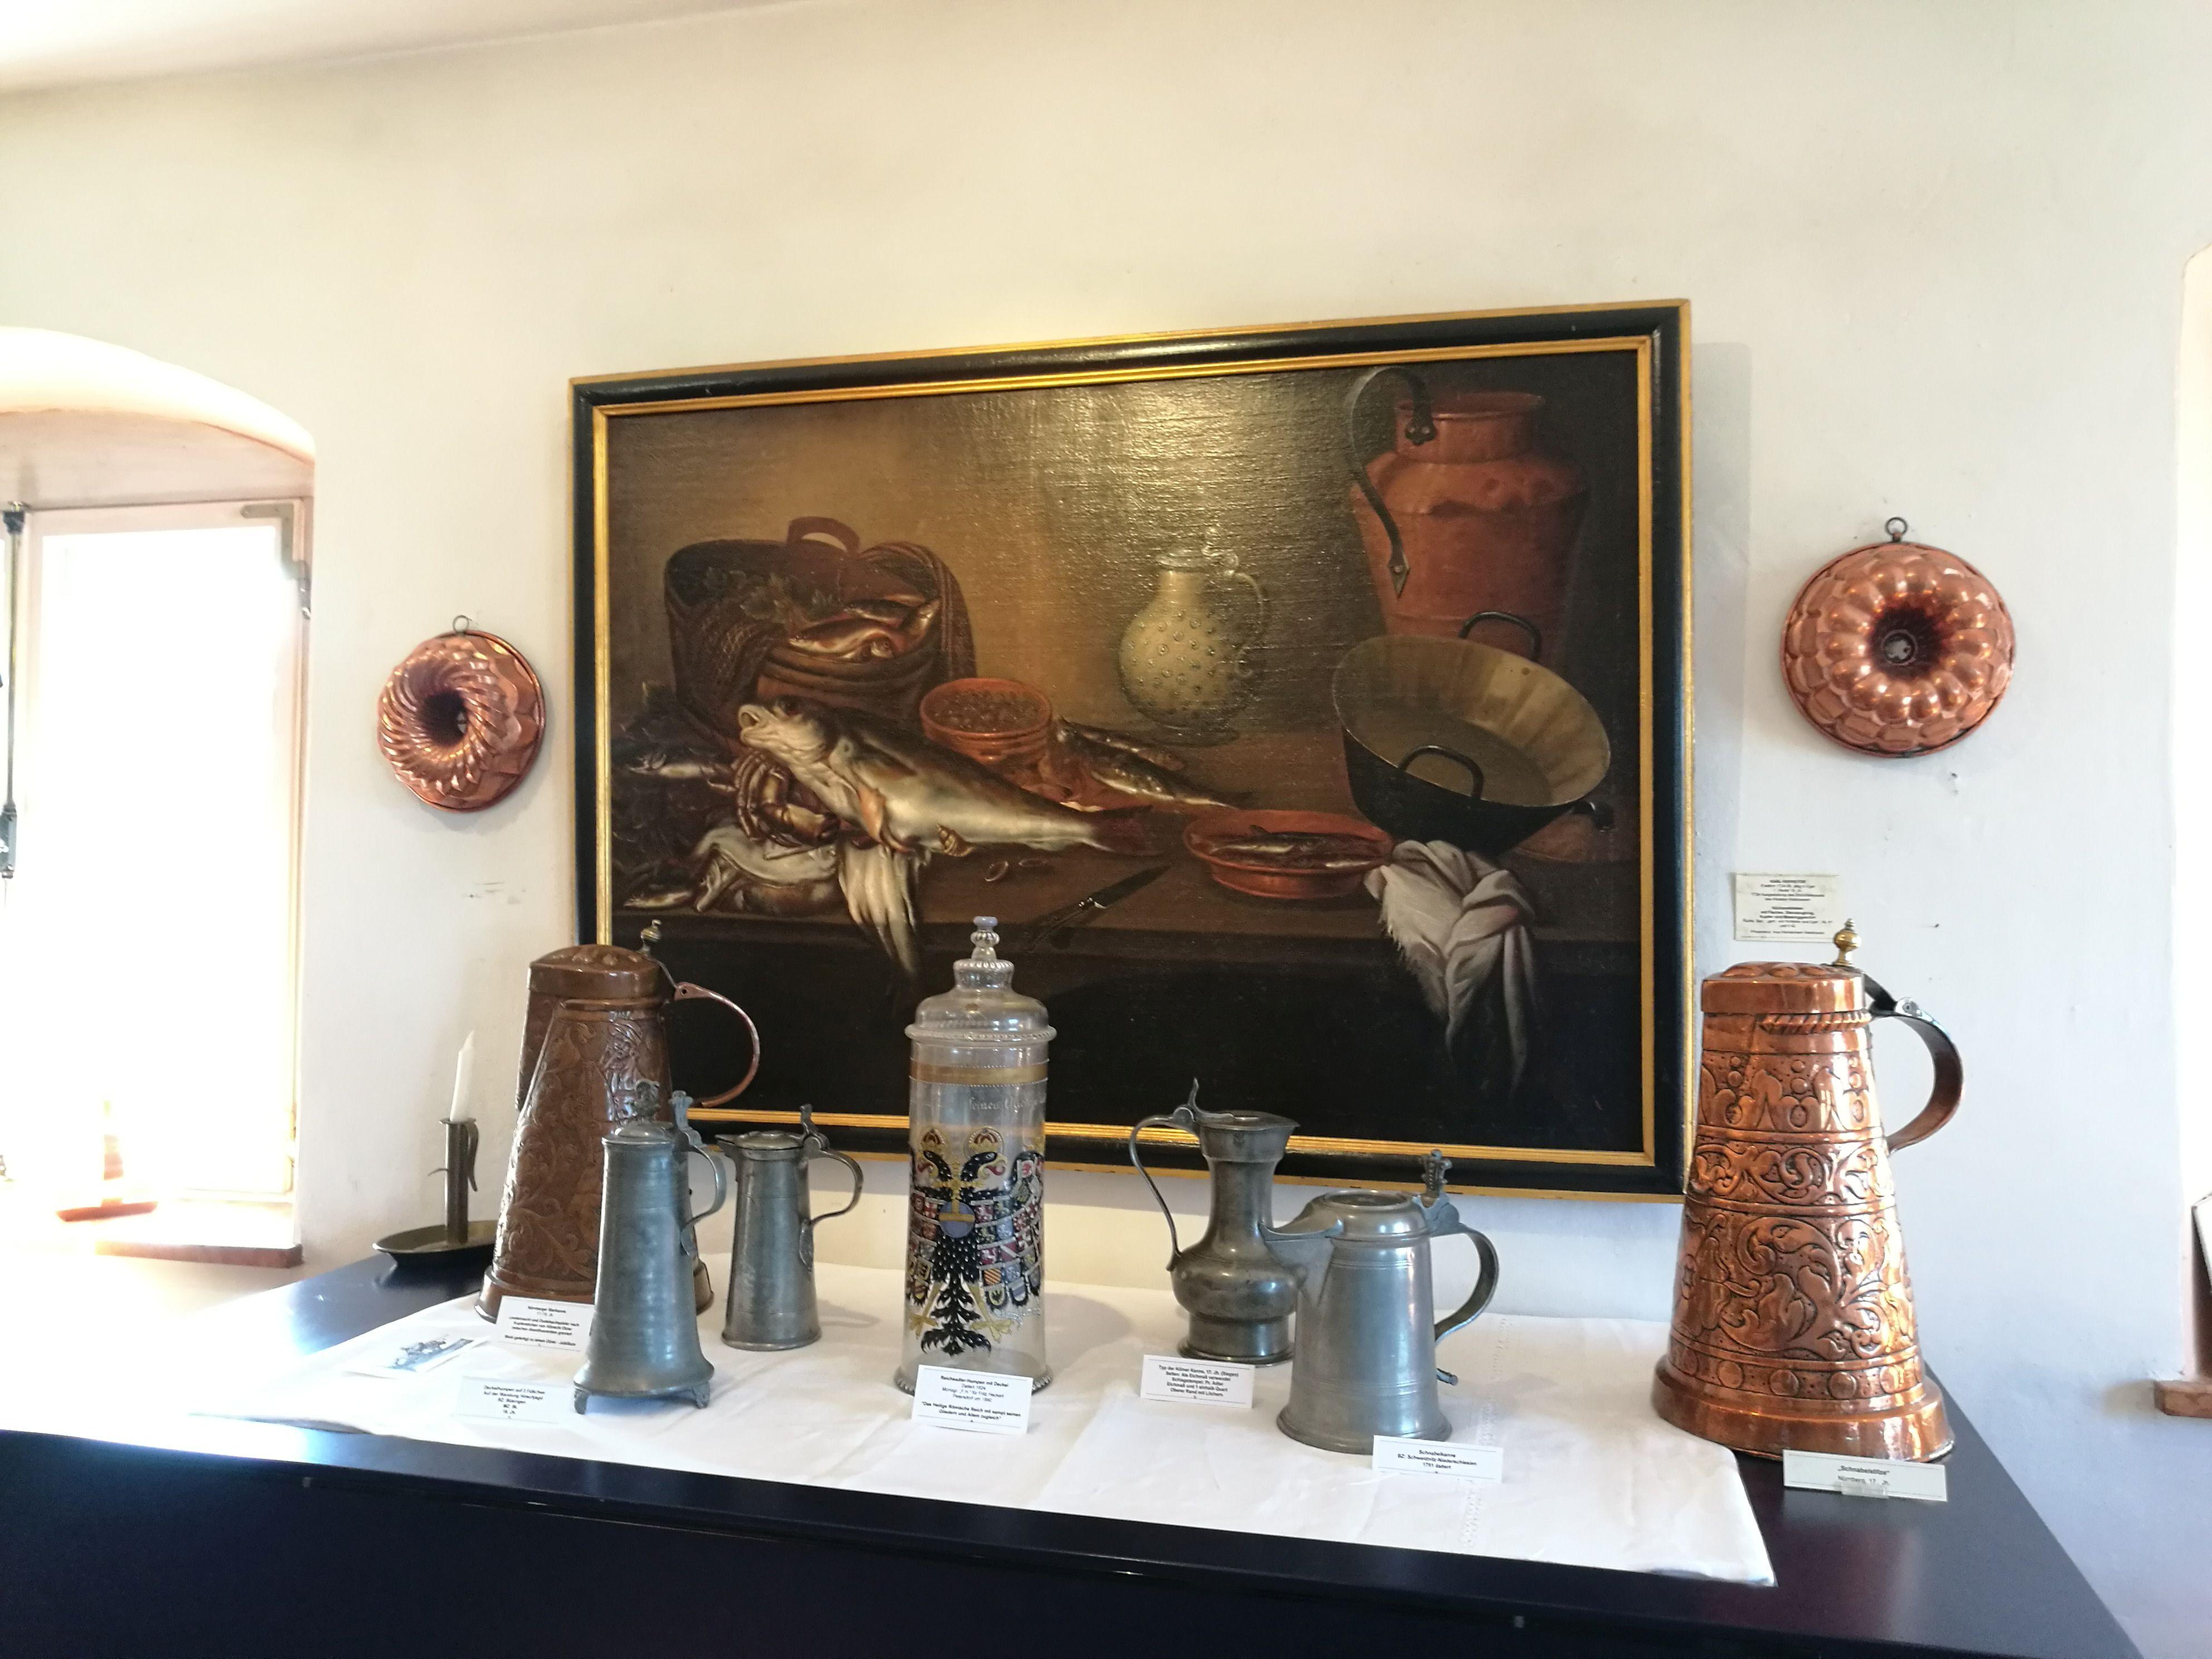 Stiftung-Kupfermuseum-Kuhnke-Sonderausstellung